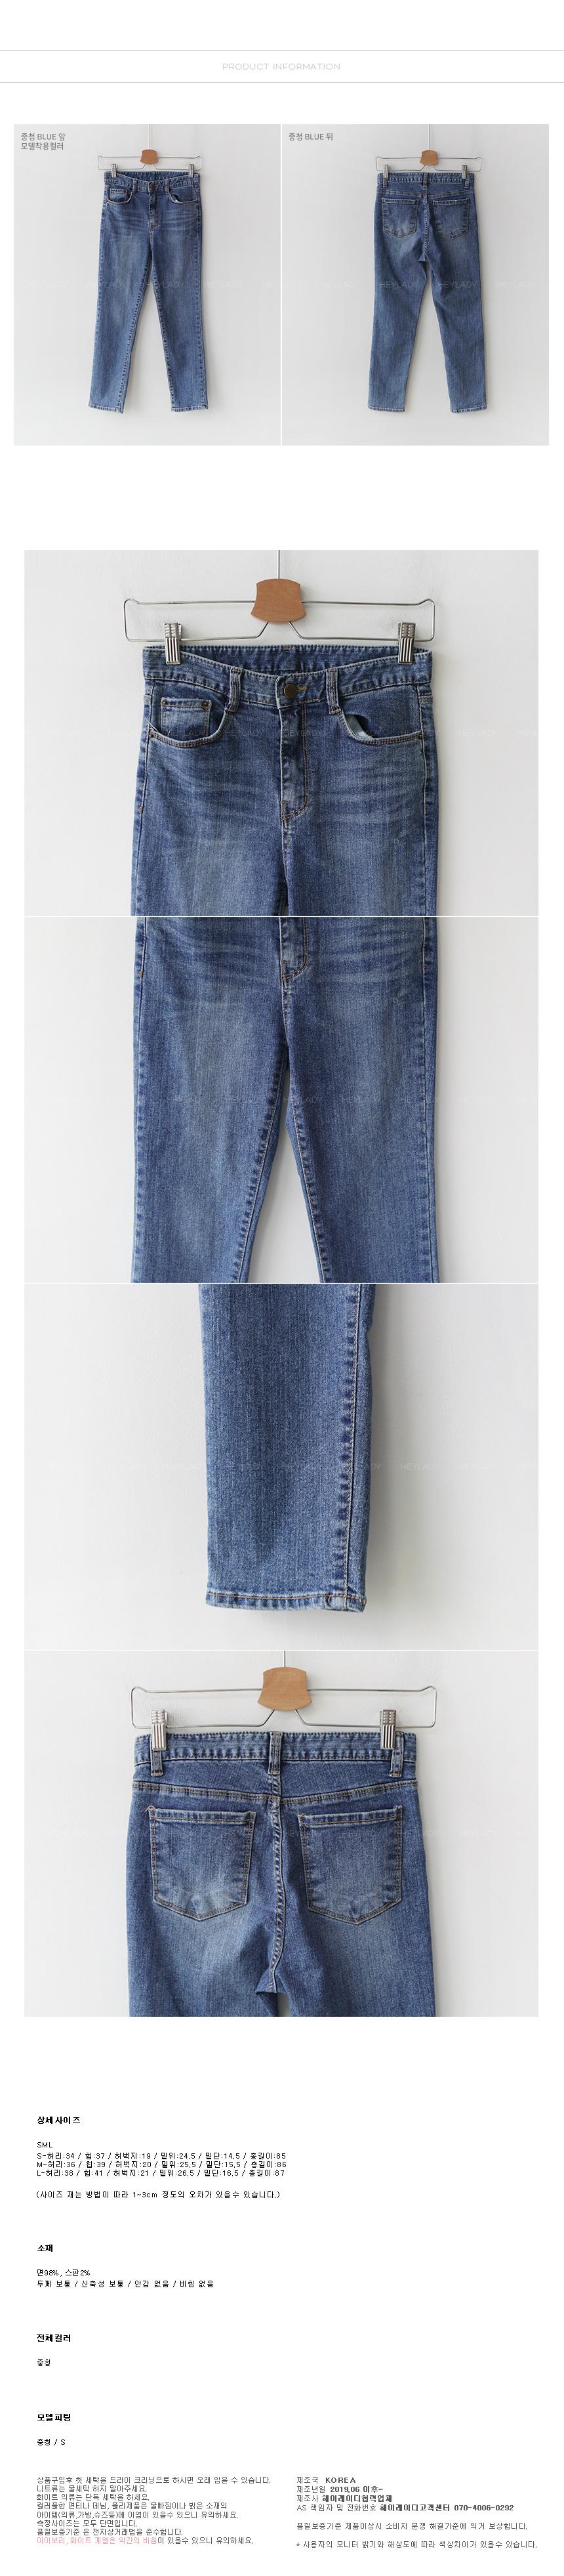 Breeches Denim Pants